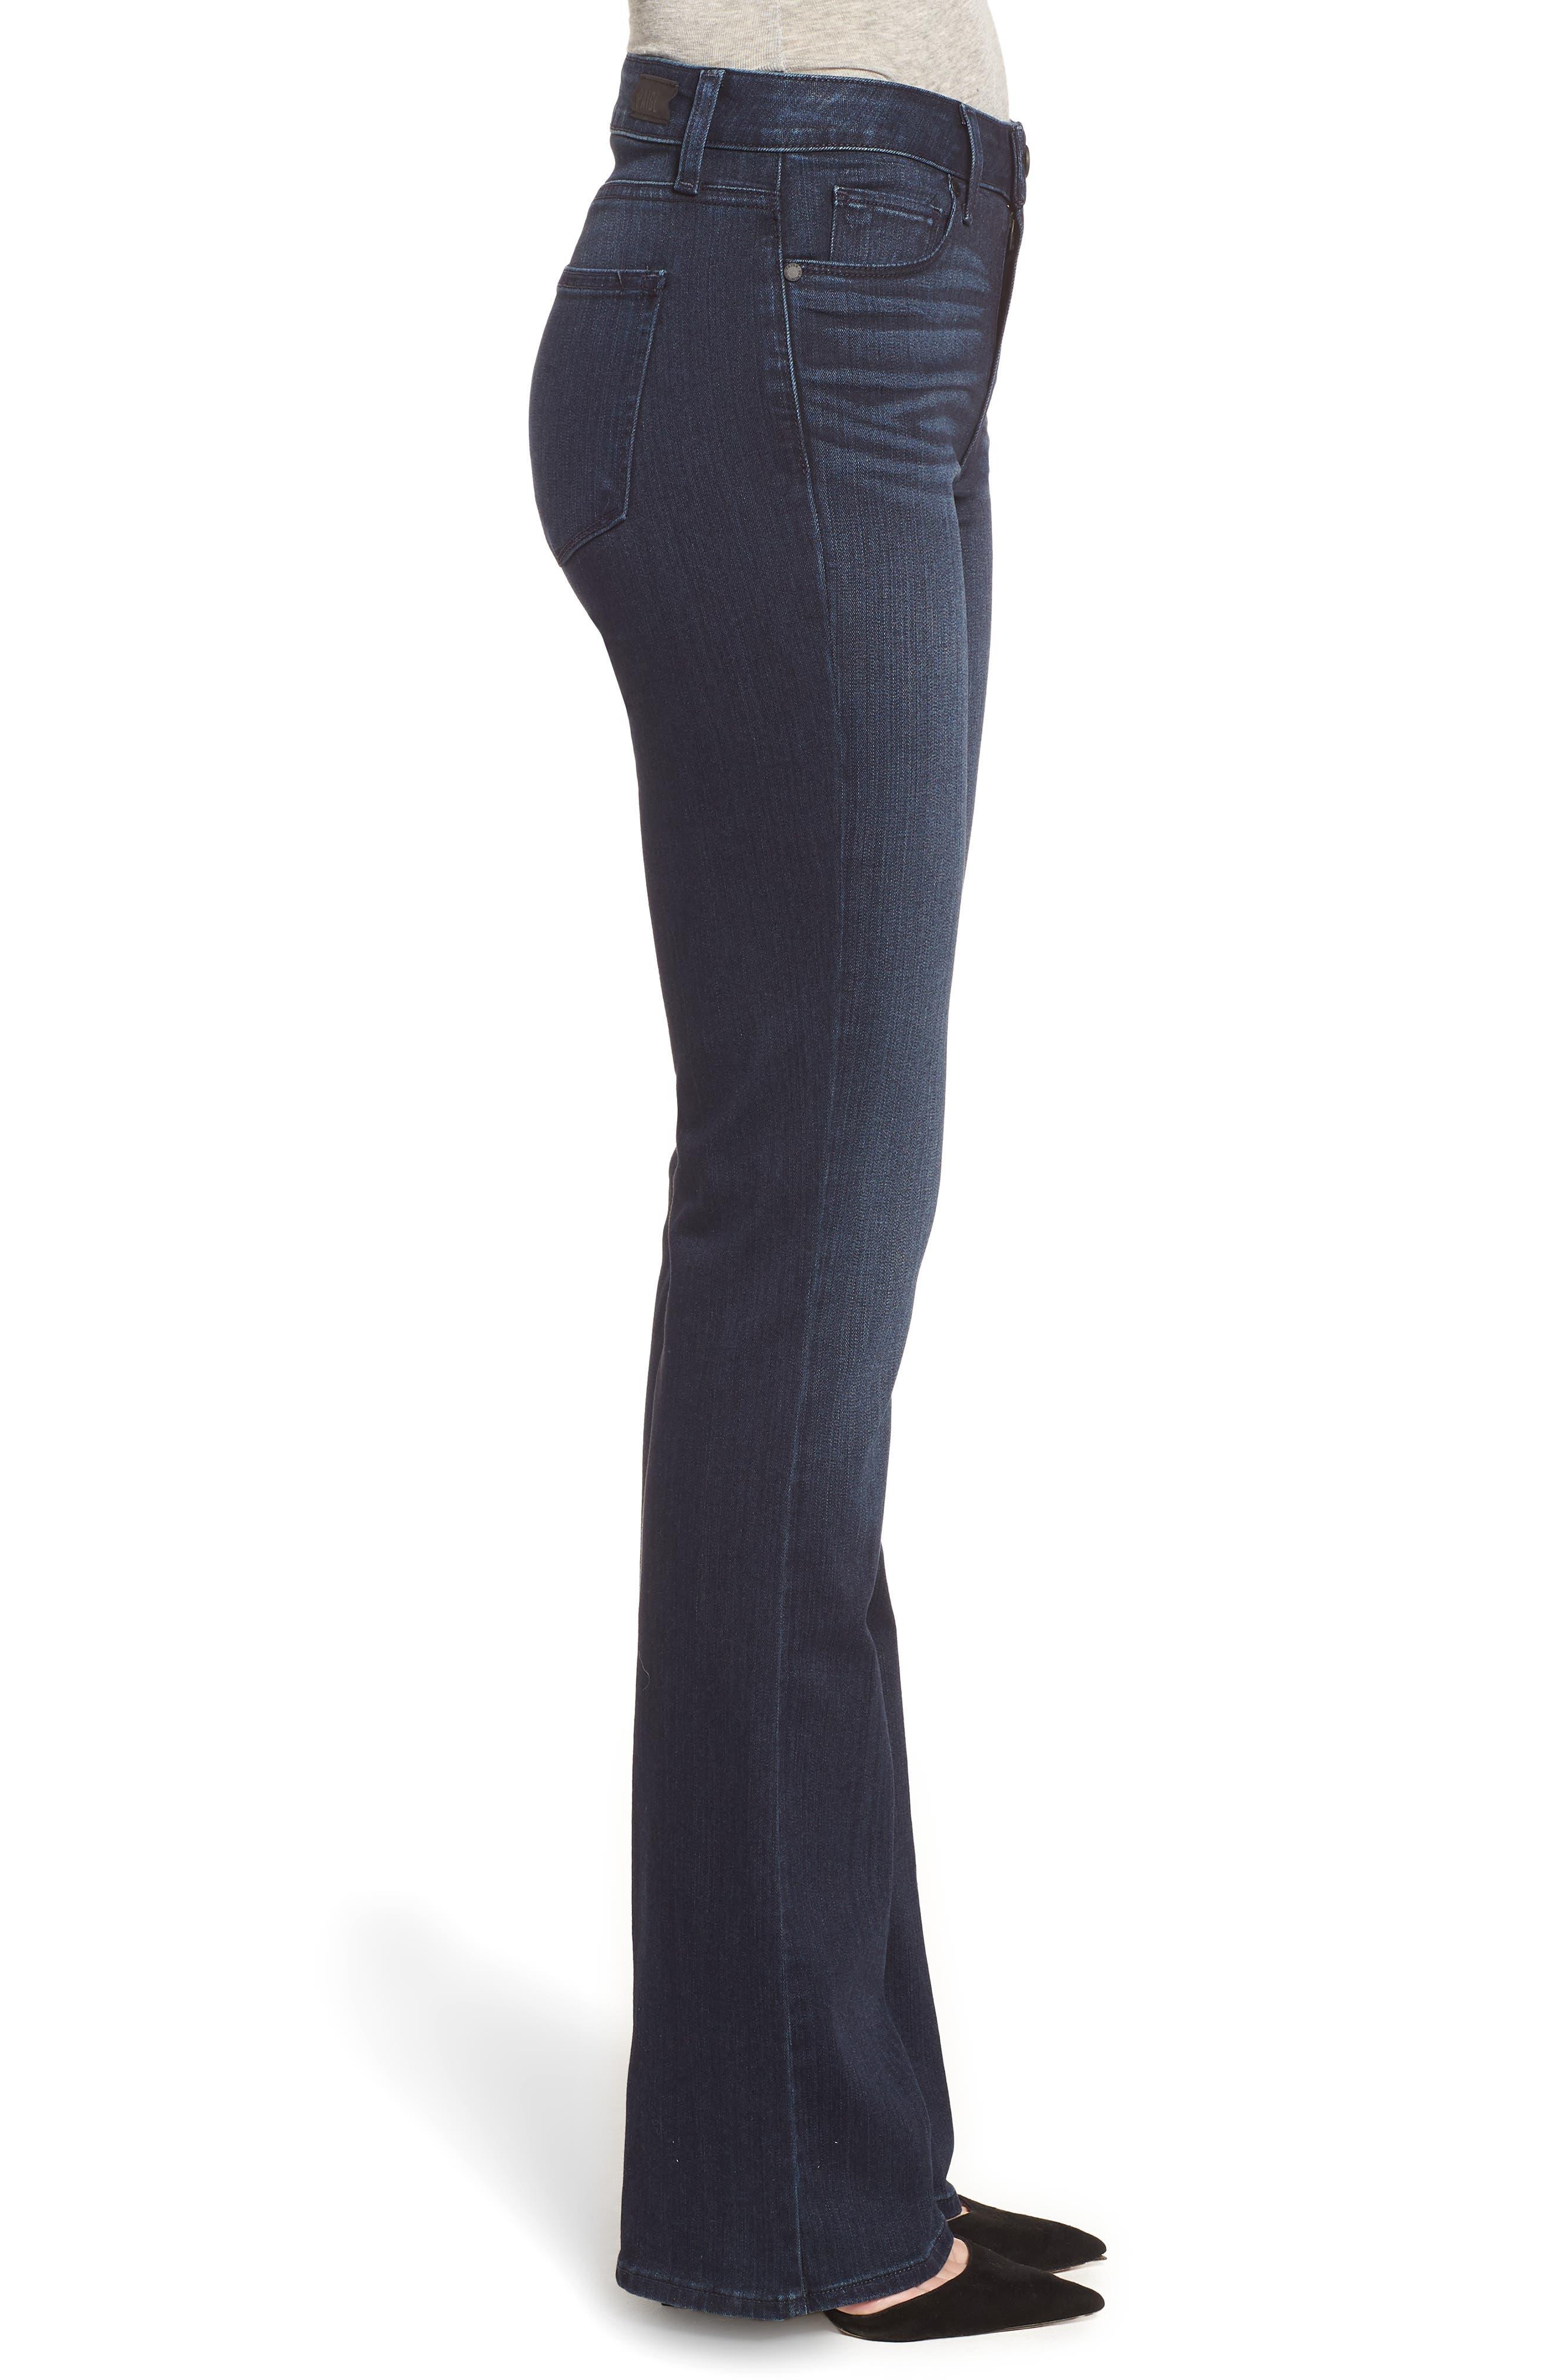 PAIGE, Manhattan High Waist Bootcut Jeans, Alternate thumbnail 4, color, ROSEVILLE